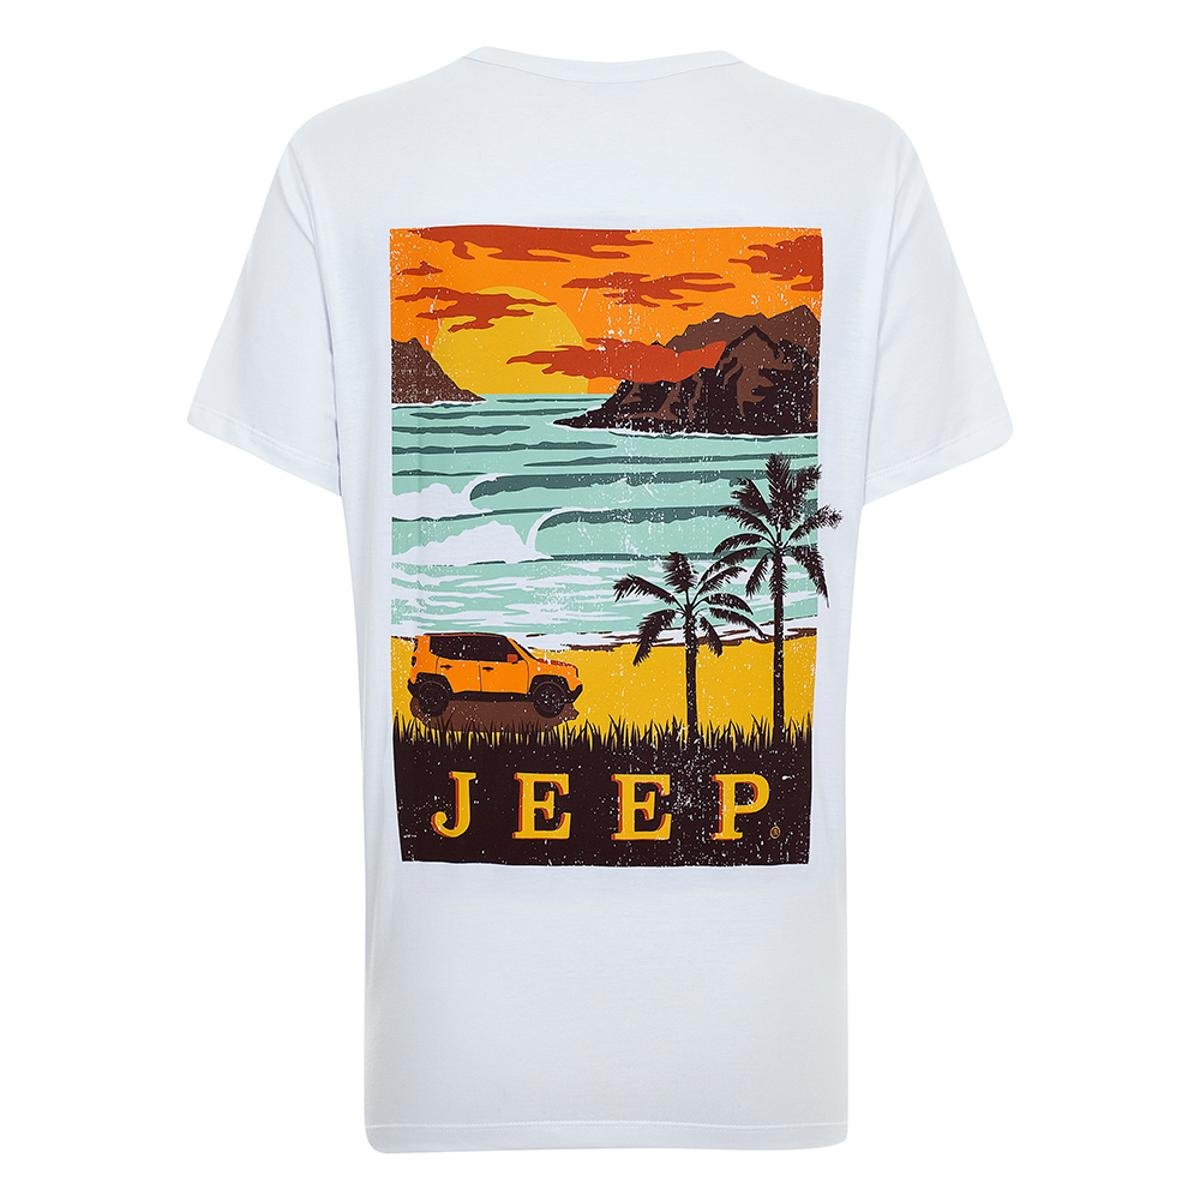 25b74c216a Camiseta JEEP Renegade Surf Feminina  Camiseta JEEP Renegade Surf Feminina  ...